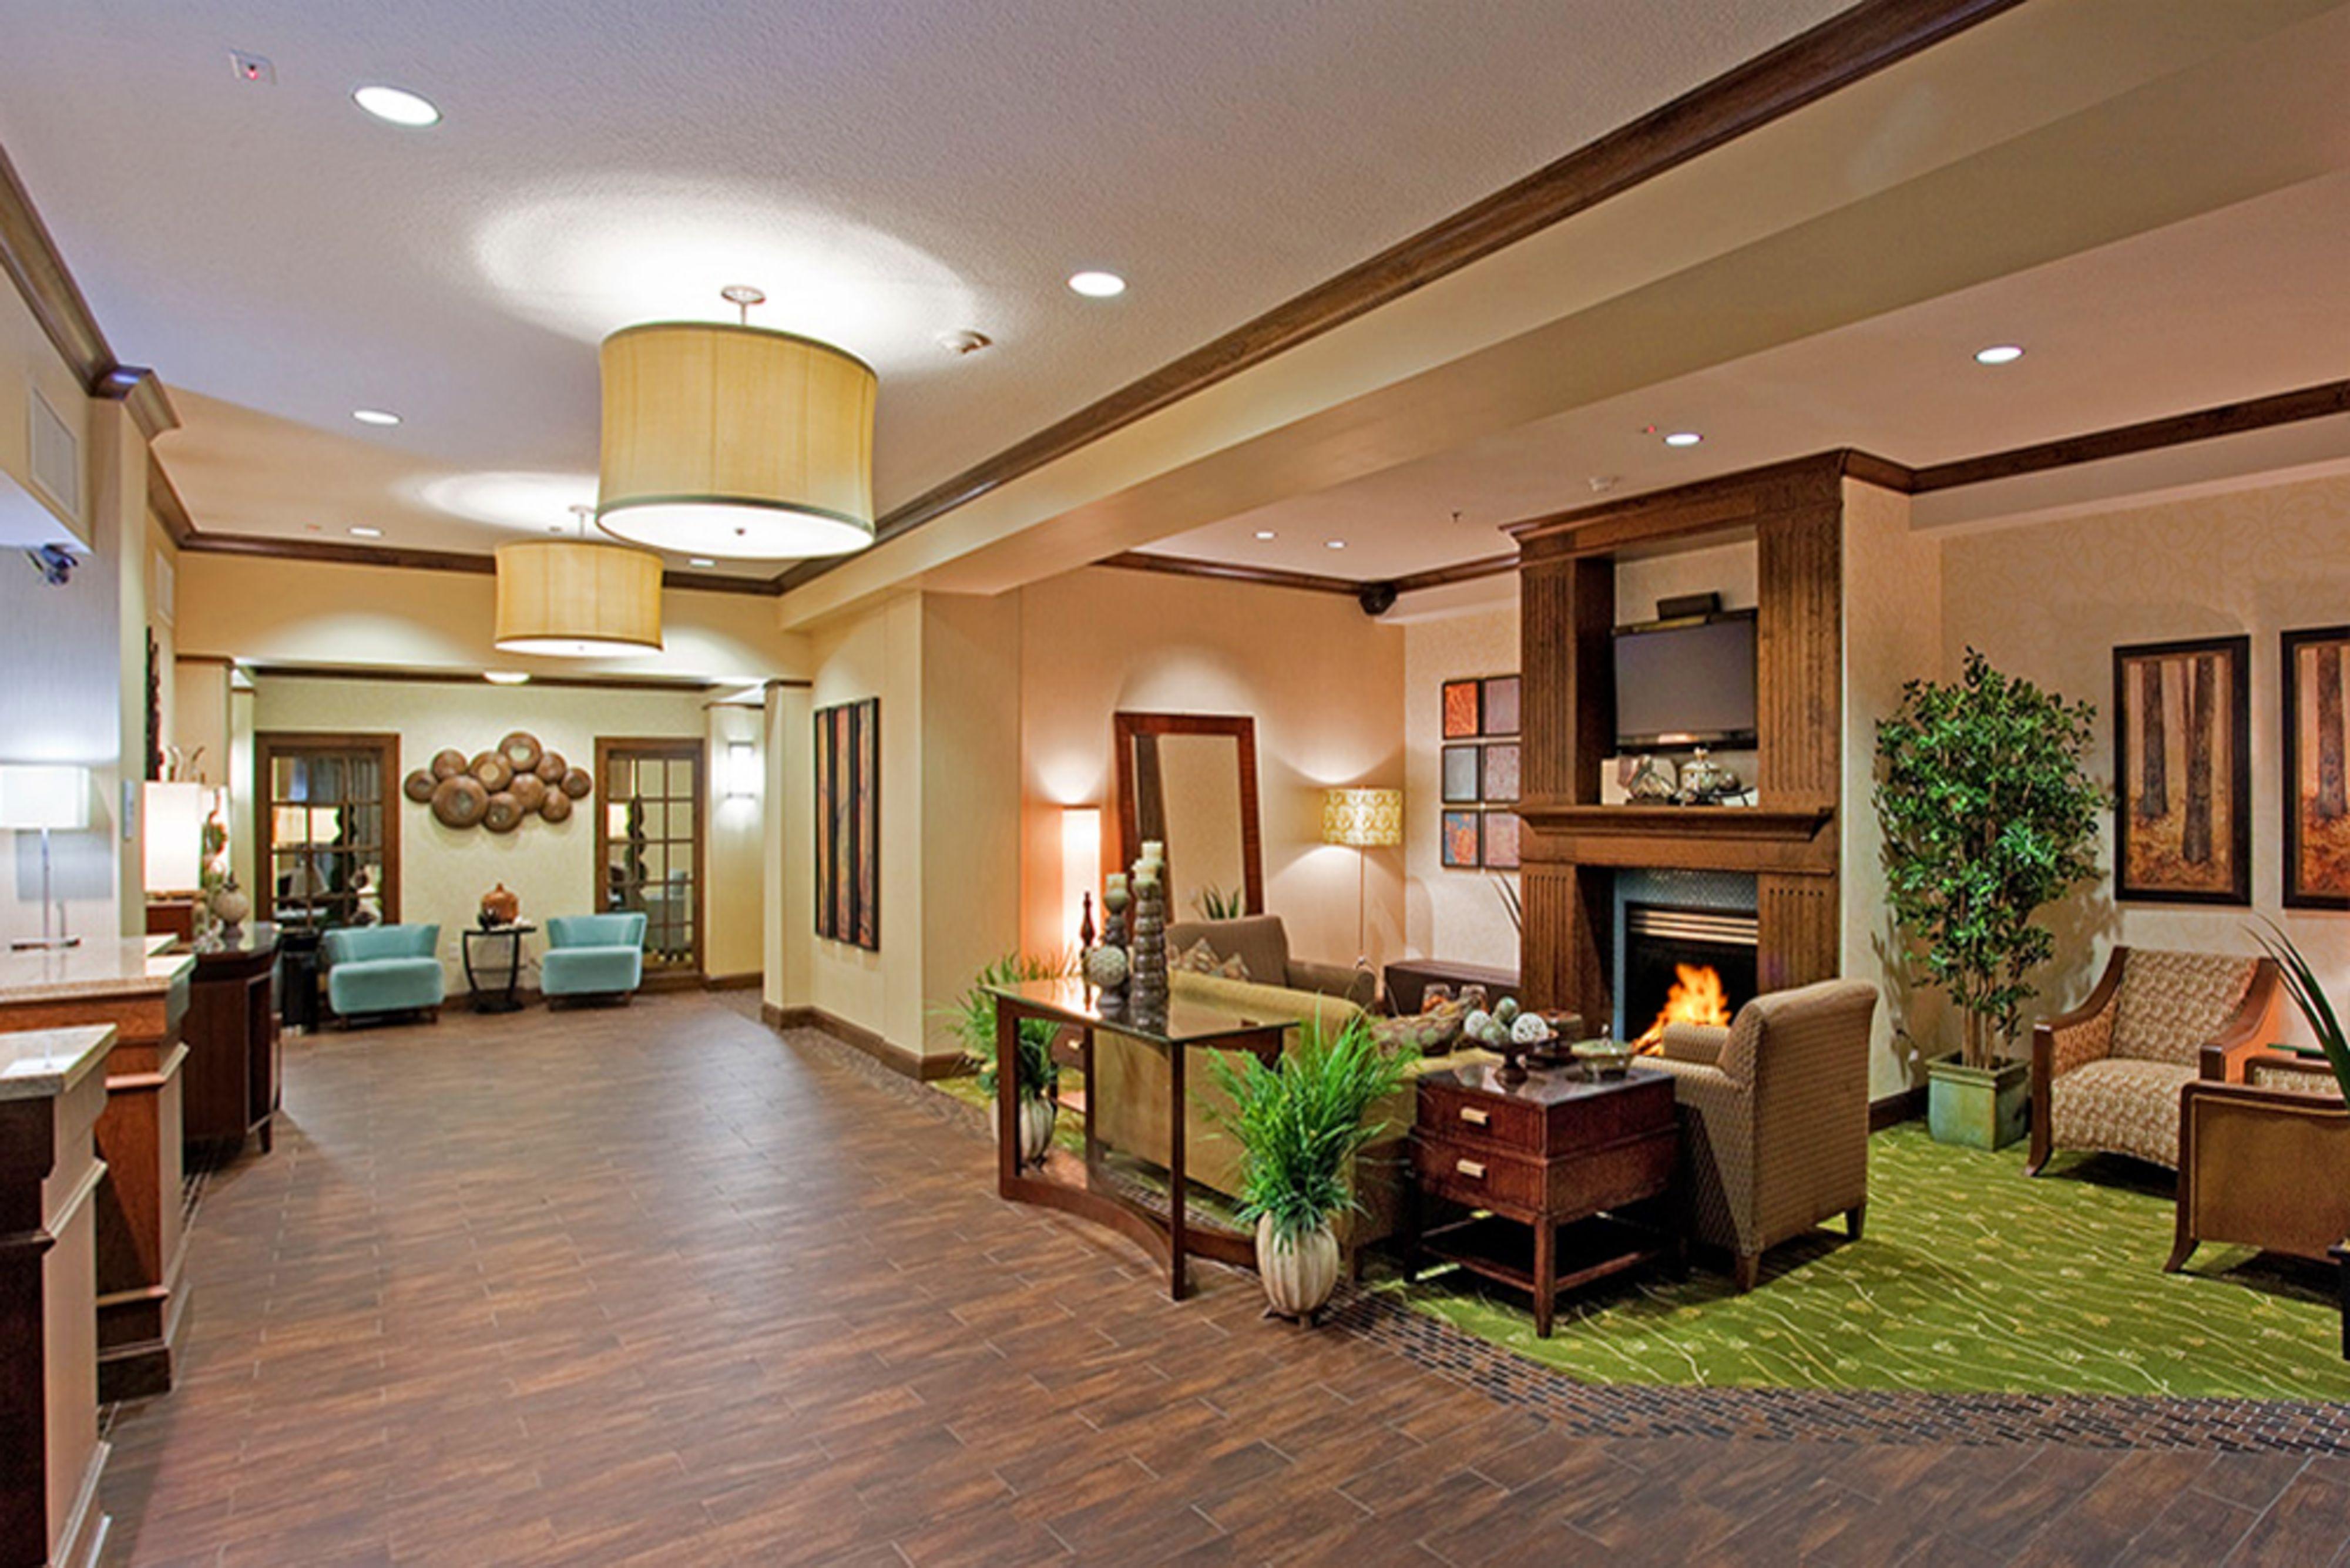 Holiday Inn Express & Suites Logan image 5